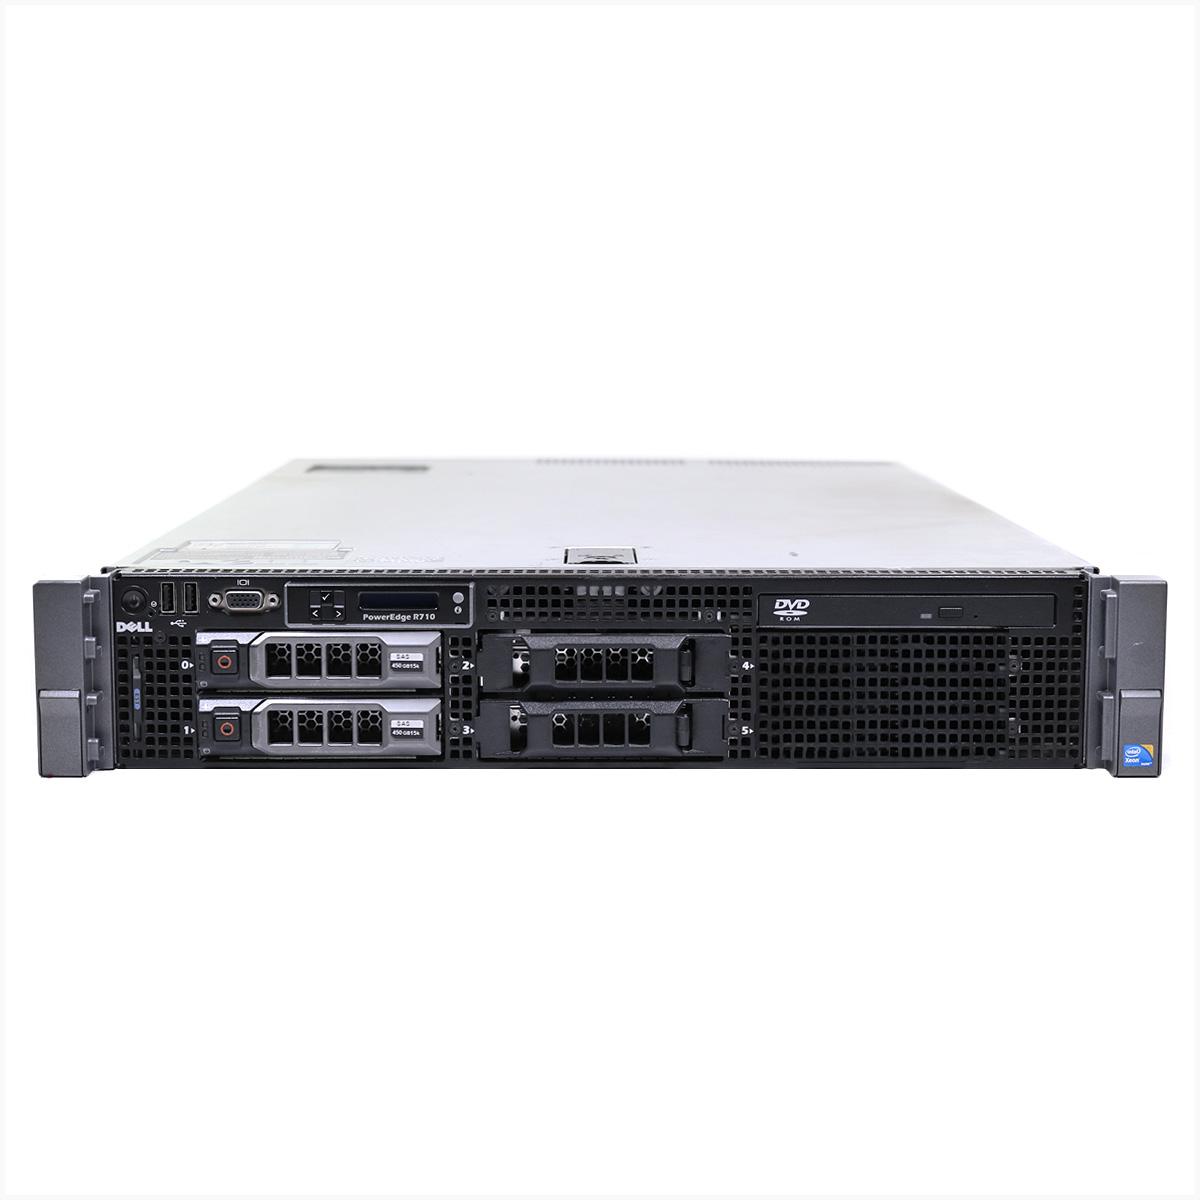 Servidor dell r710 2x xeon e5620 64gb 2x 1tb sas - usado